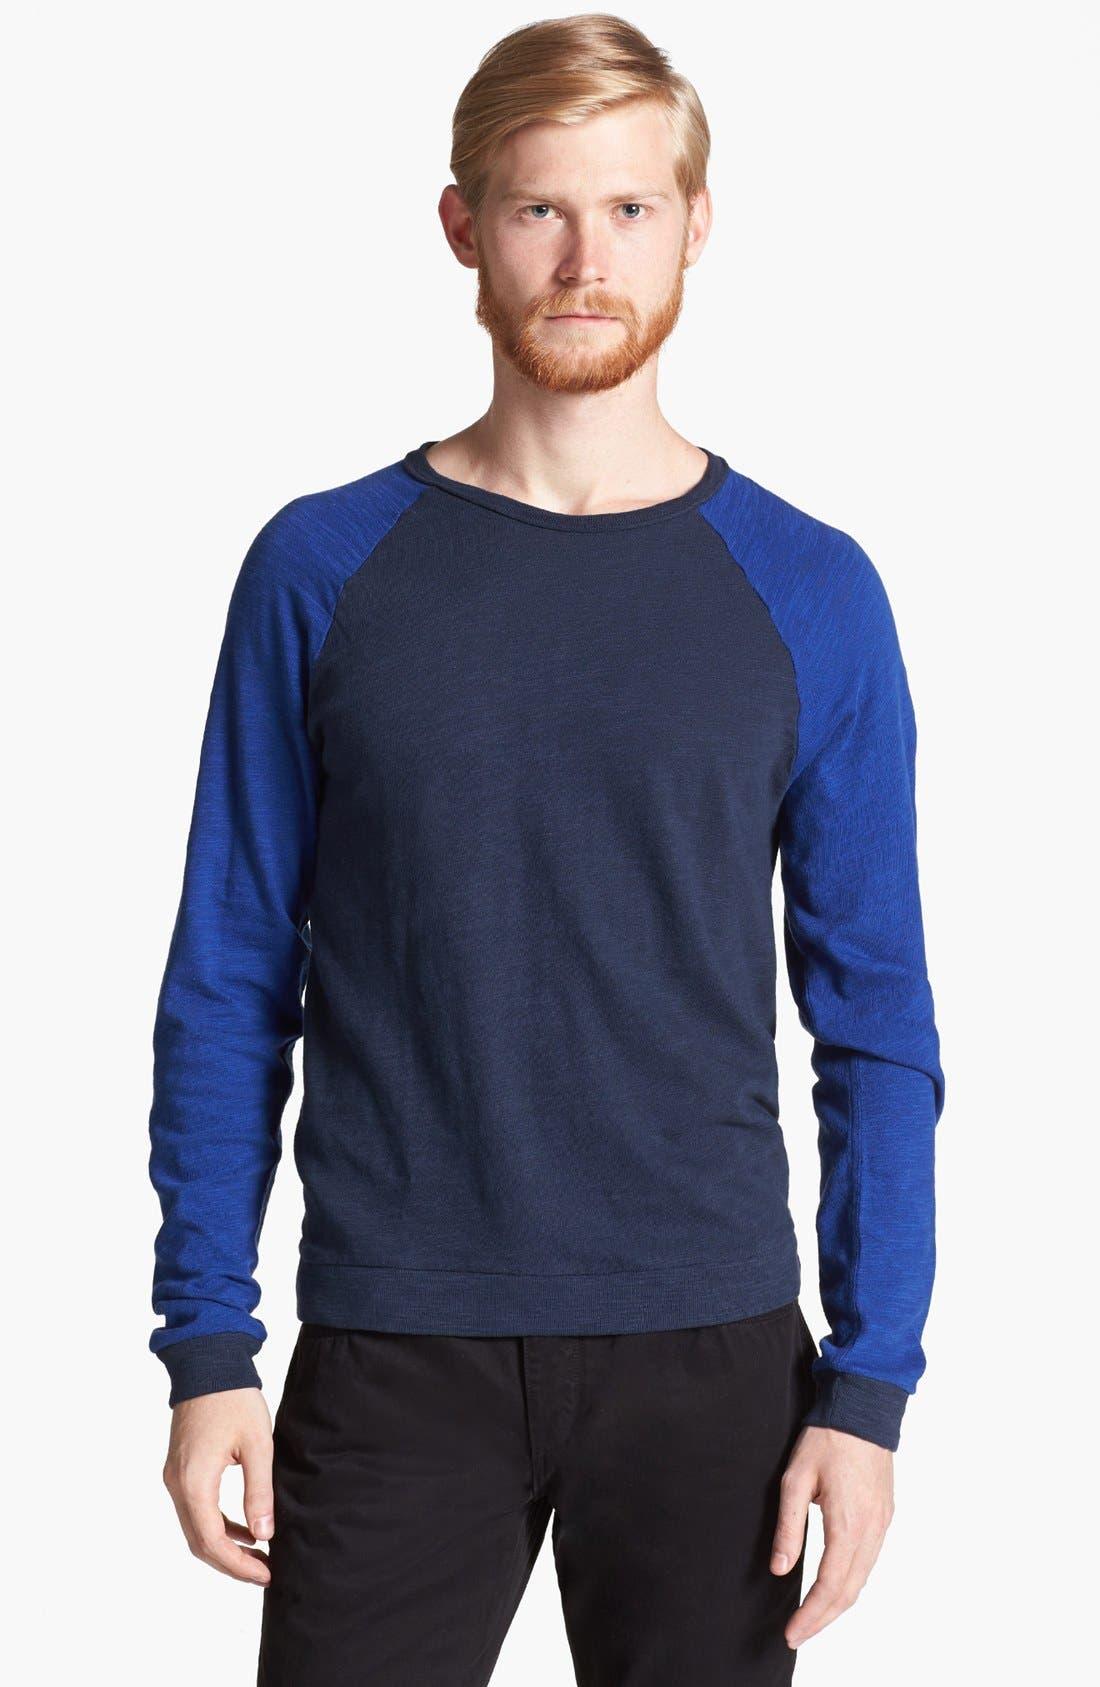 Alternate Image 1 Selected - rag & bone Lightweight Crewneck Sweatshirt